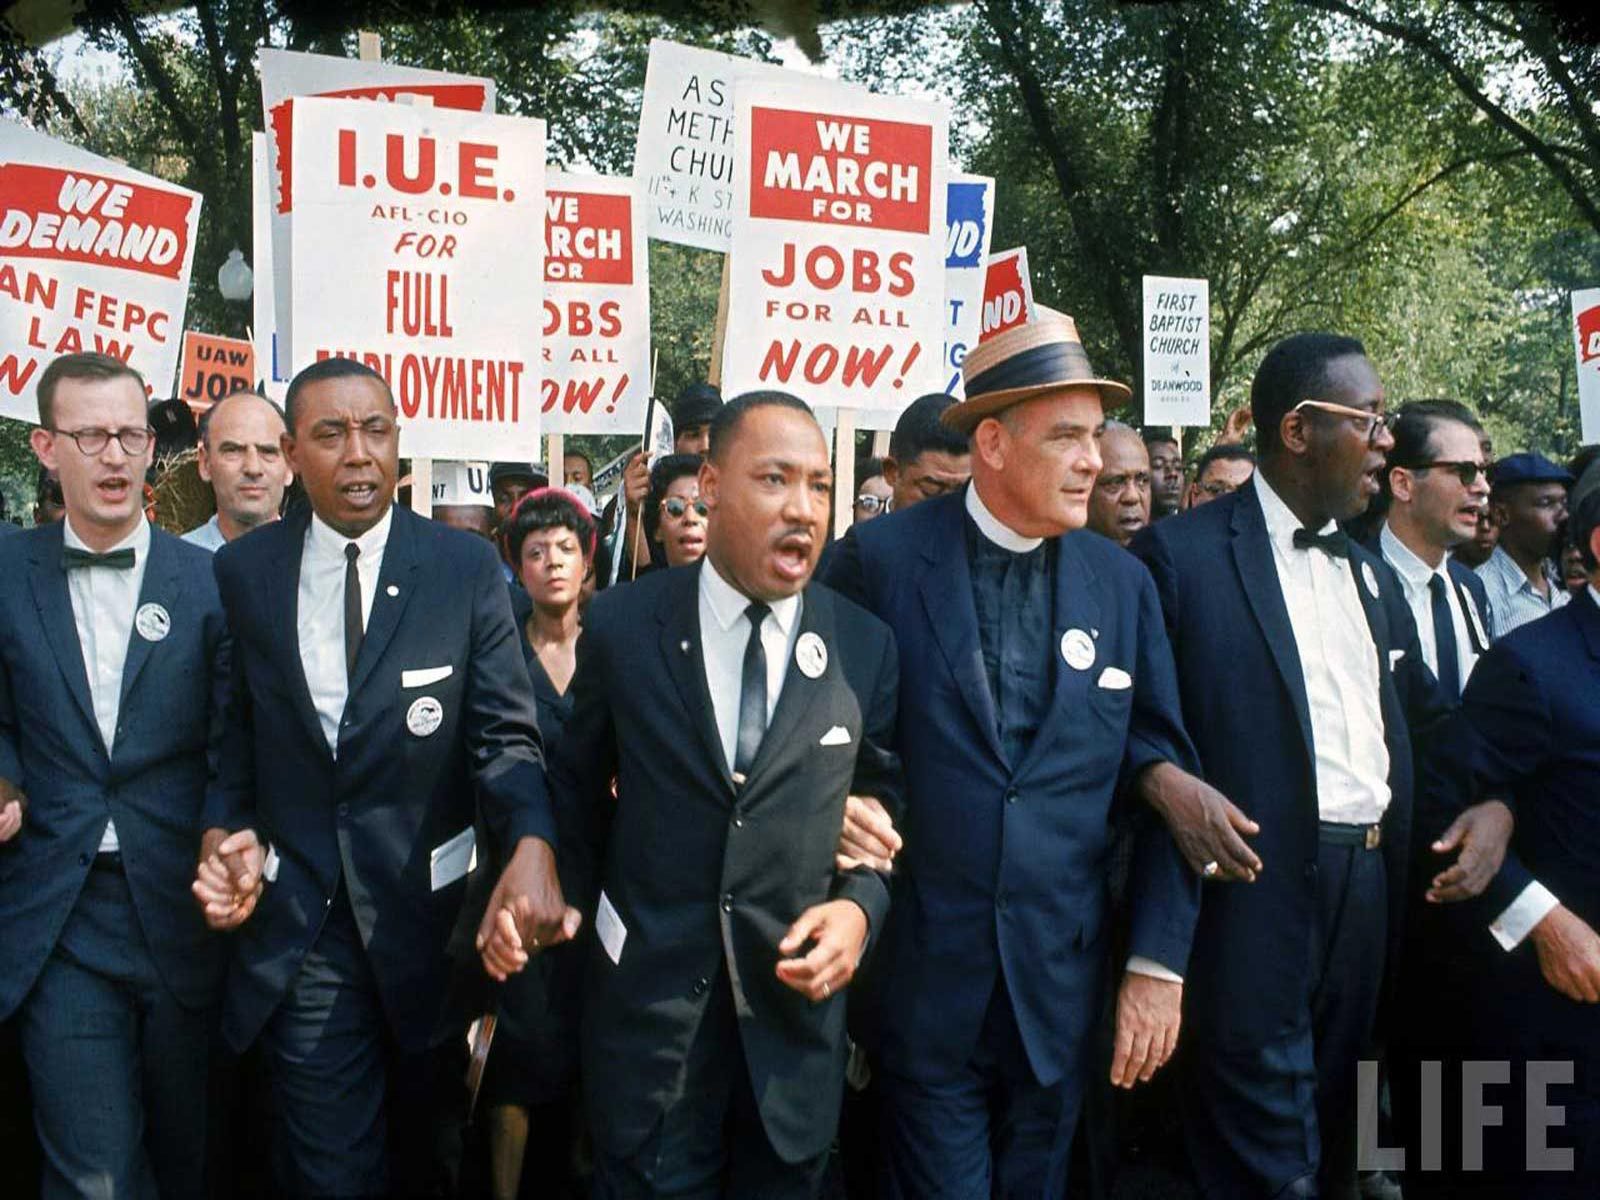 http://1.bp.blogspot.com/-PZW69GHW7JQ/UPlBUg2xv9I/AAAAAAAAAk8/6ea4TmJQBMY/s1600/Martin-Luther-King-Jr.-March.jpg